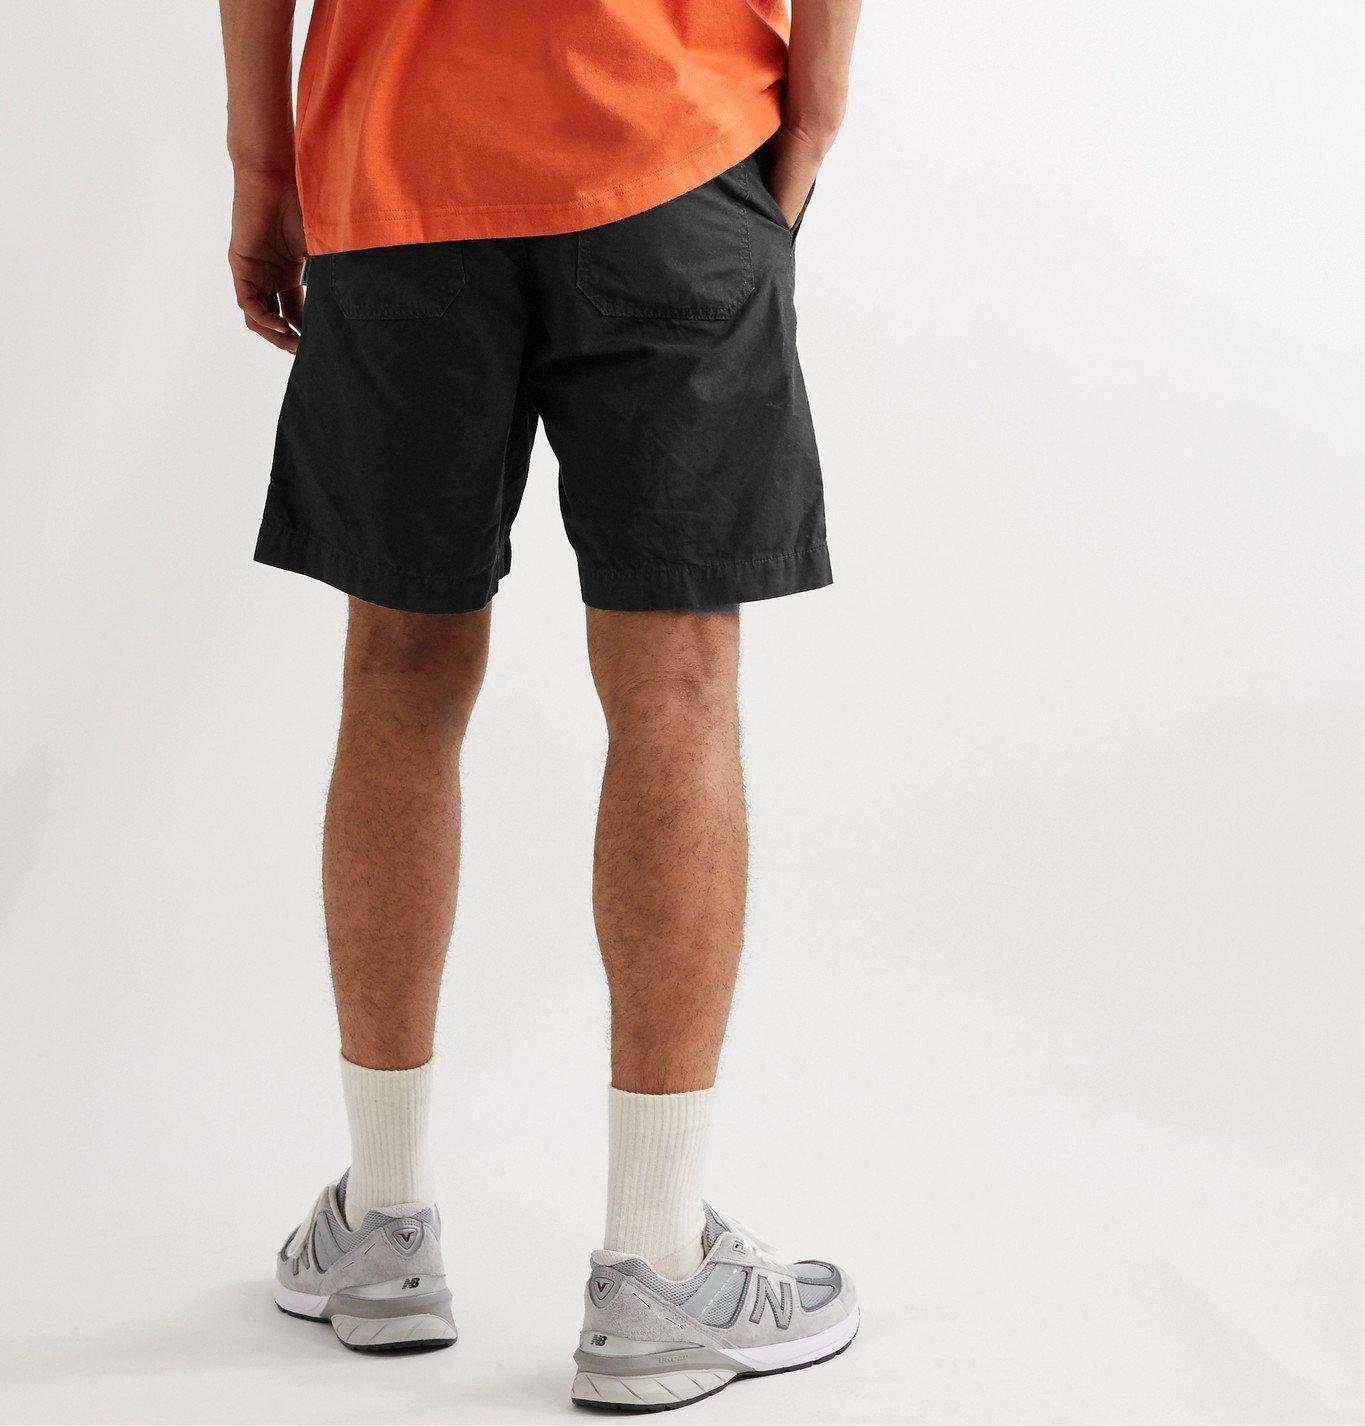 WTAPS - Buds Wide-Leg Cotton-Ripstop Shorts - Black